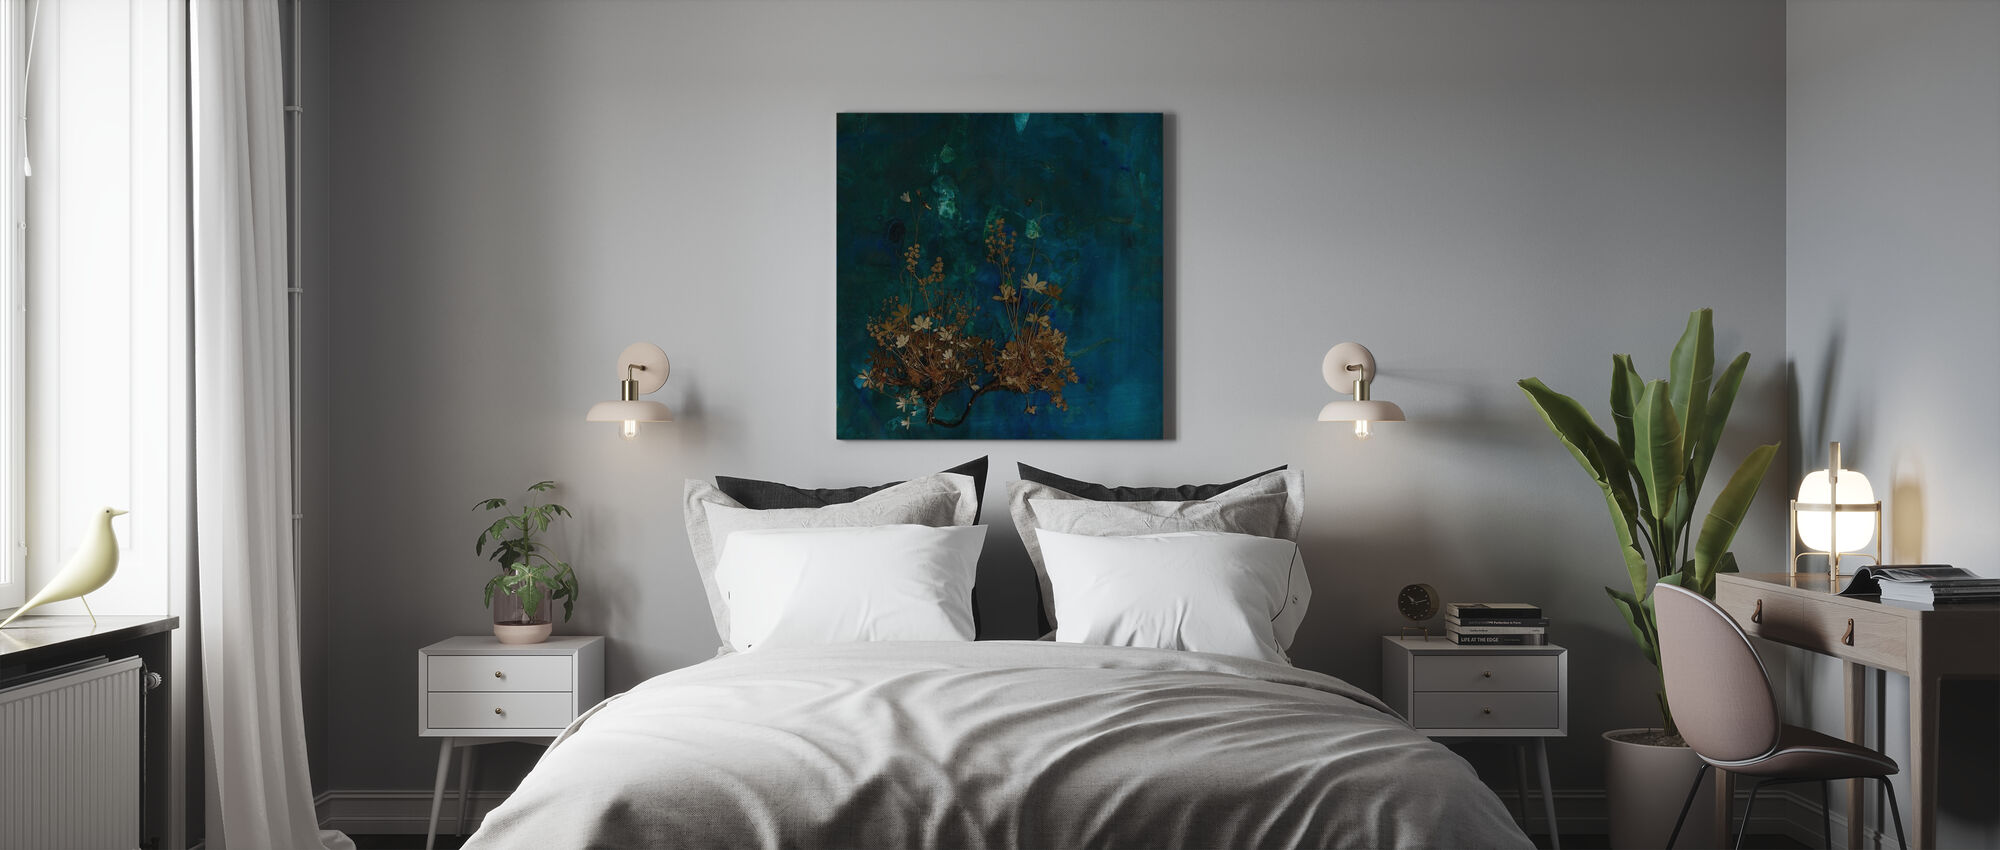 Plateau - Canvas print - Bedroom